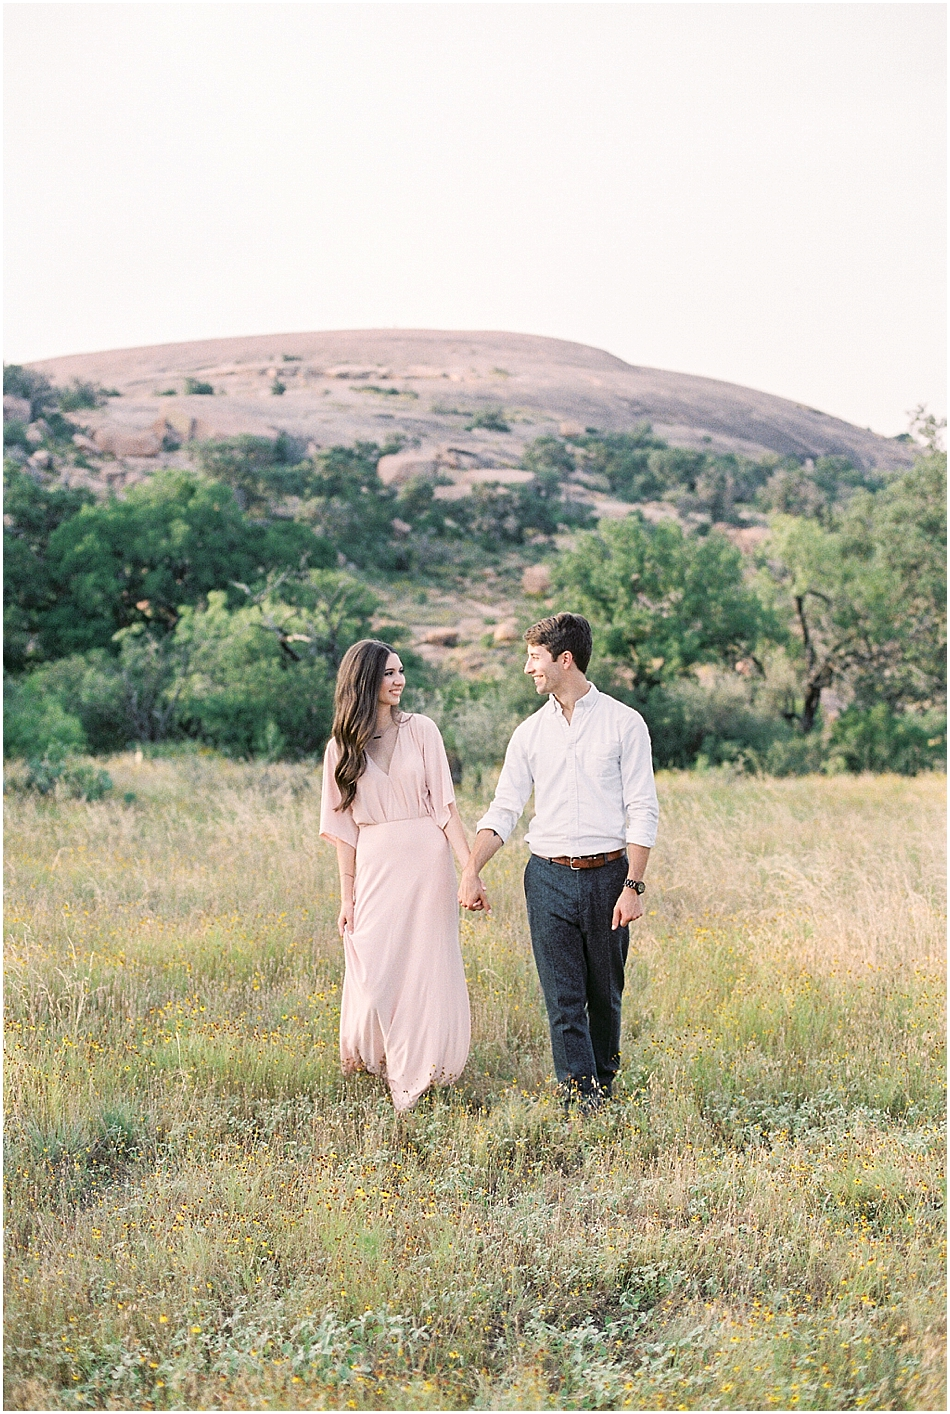 Emilie Anne Photography | Fine Art Film | Featured | Magnolia Rouge | Central Texas-23.jpg